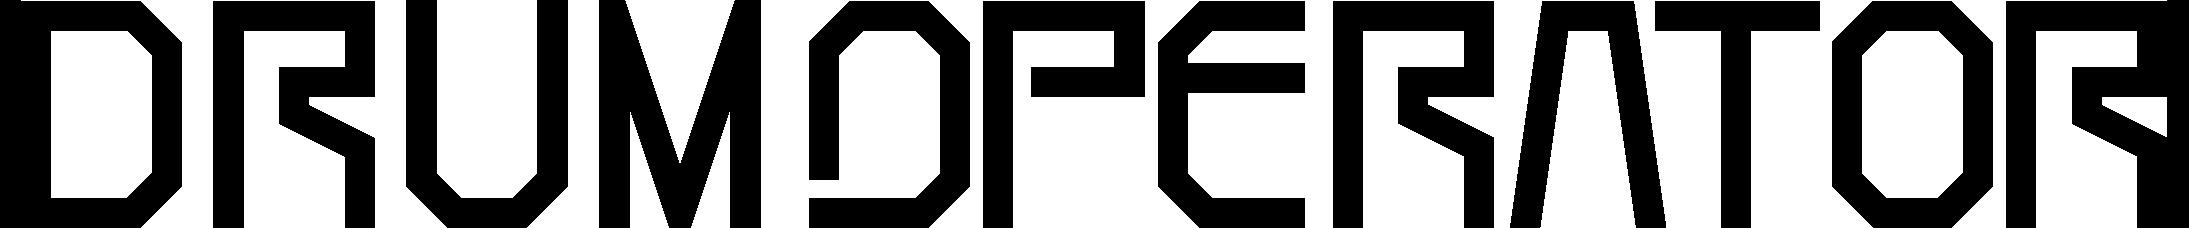 drum operator logo old .png